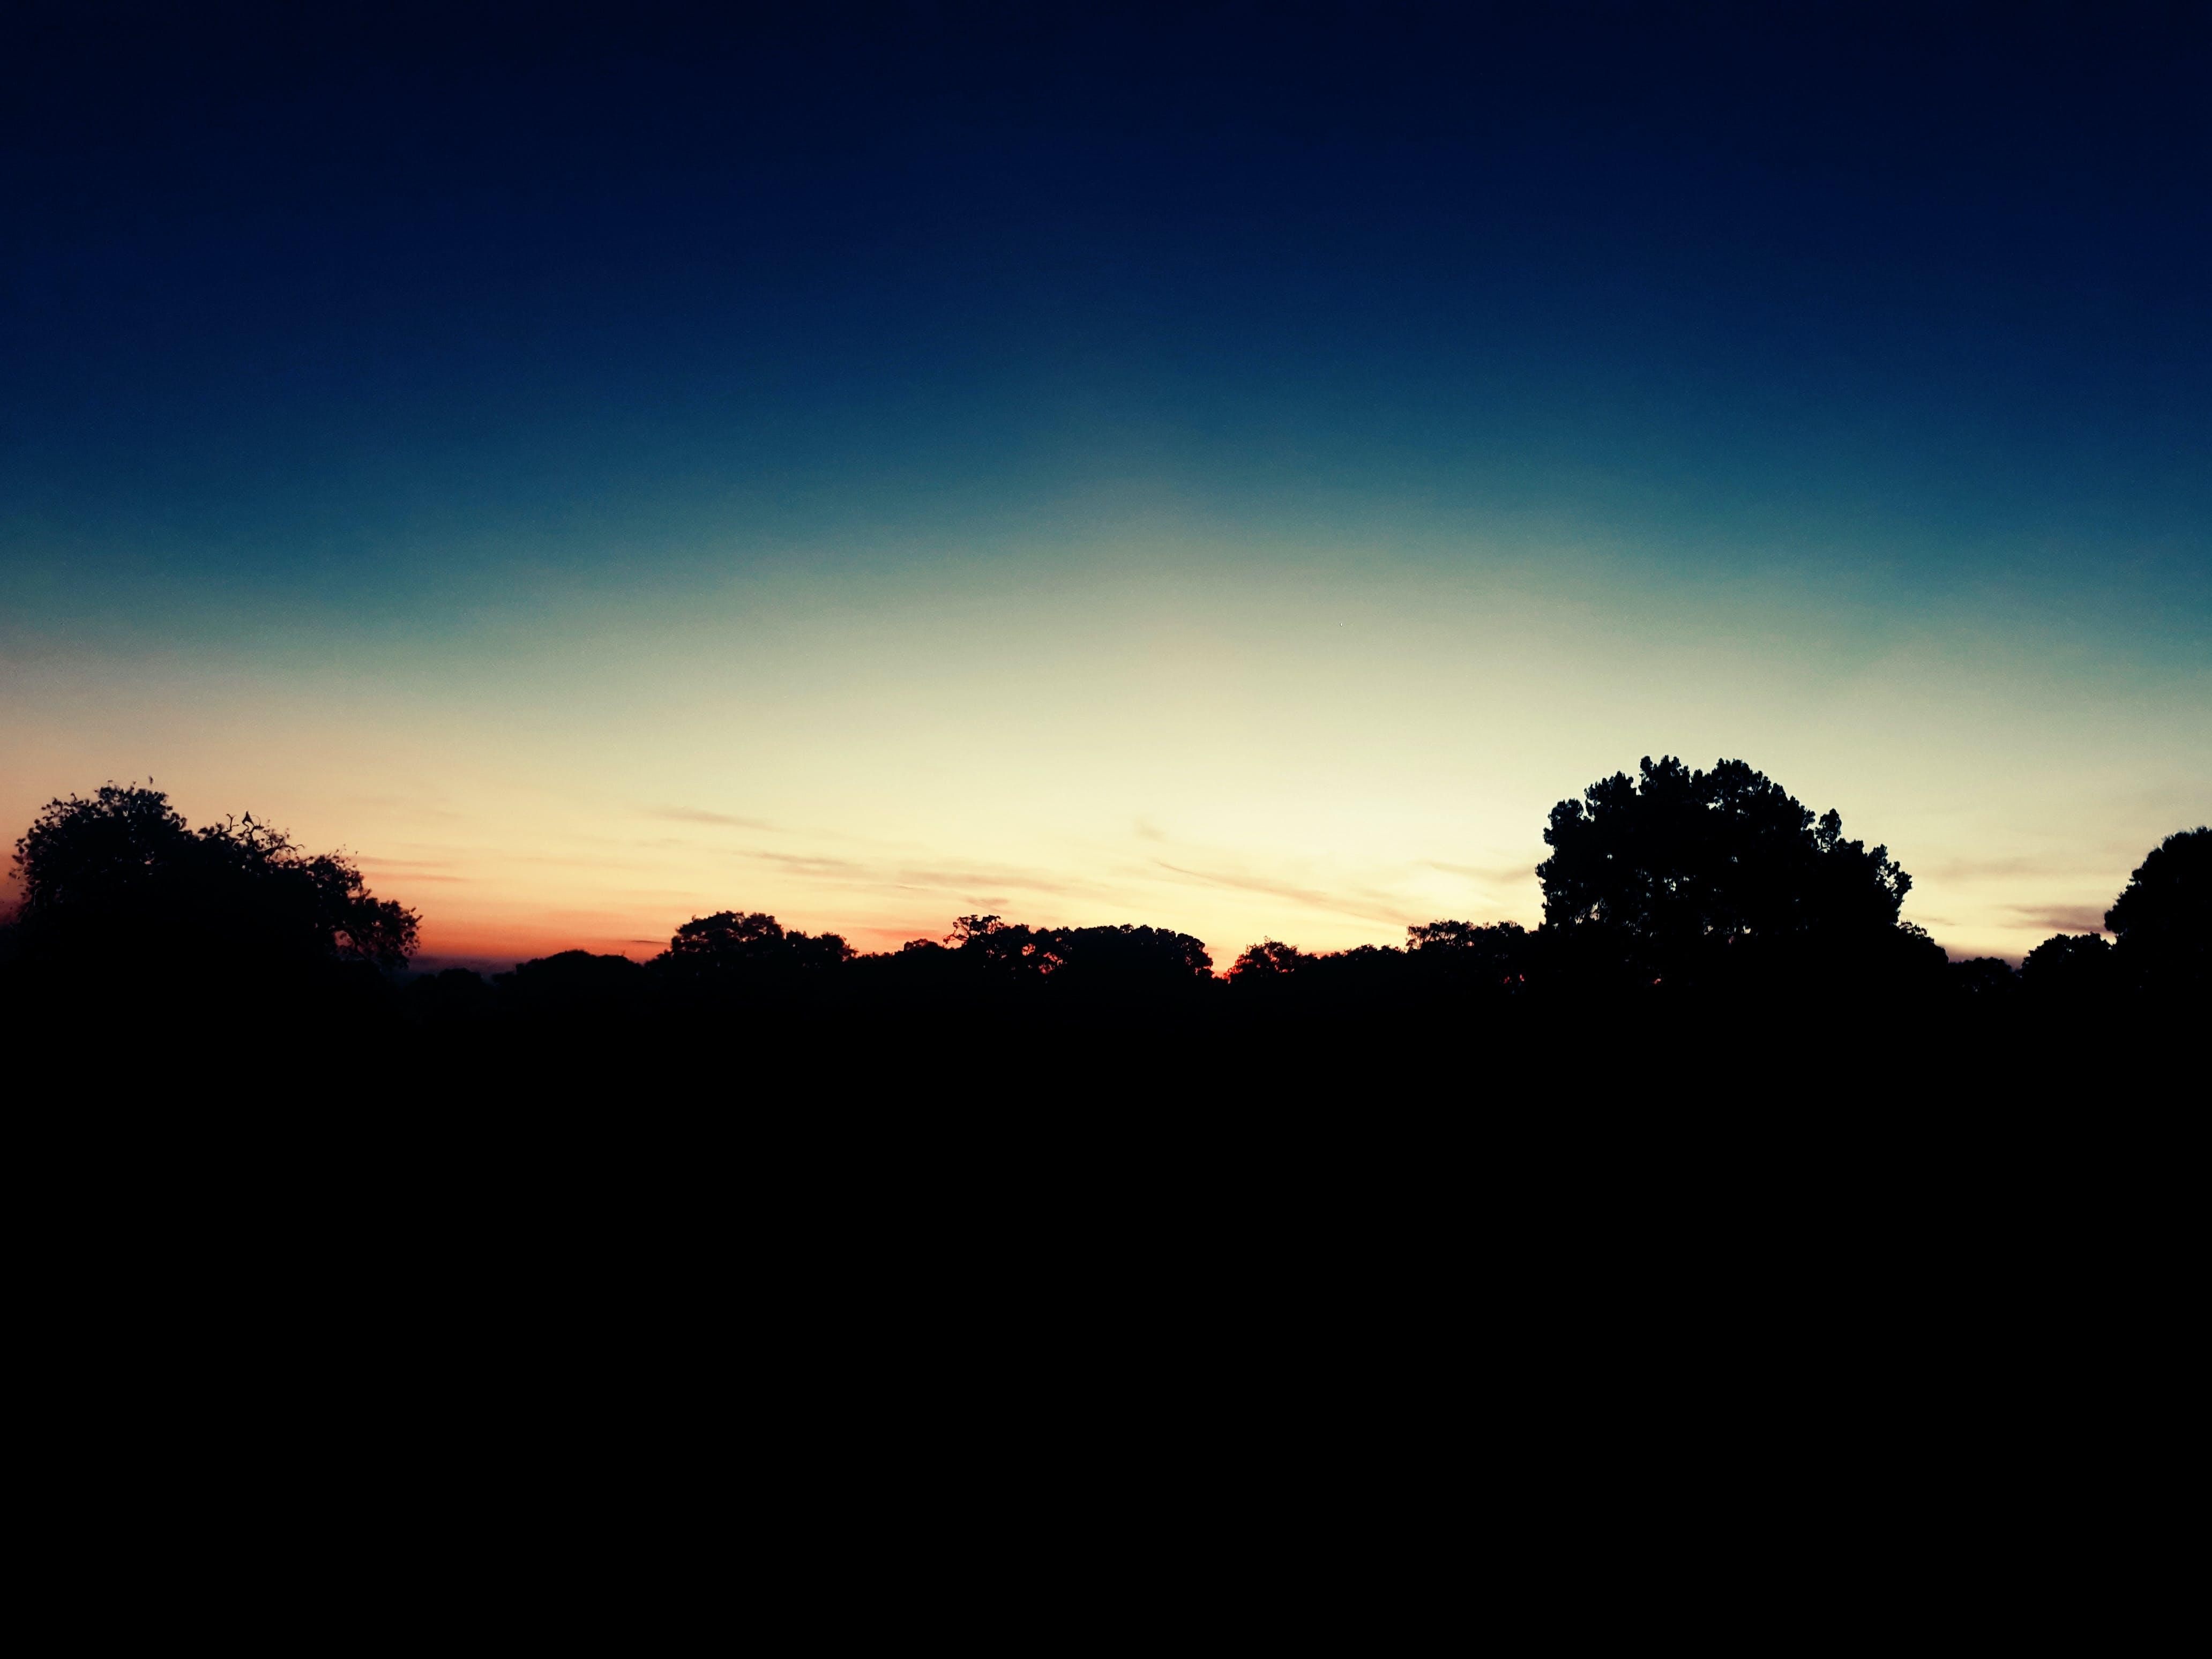 Free stock photo of dawn, silhouette, tree